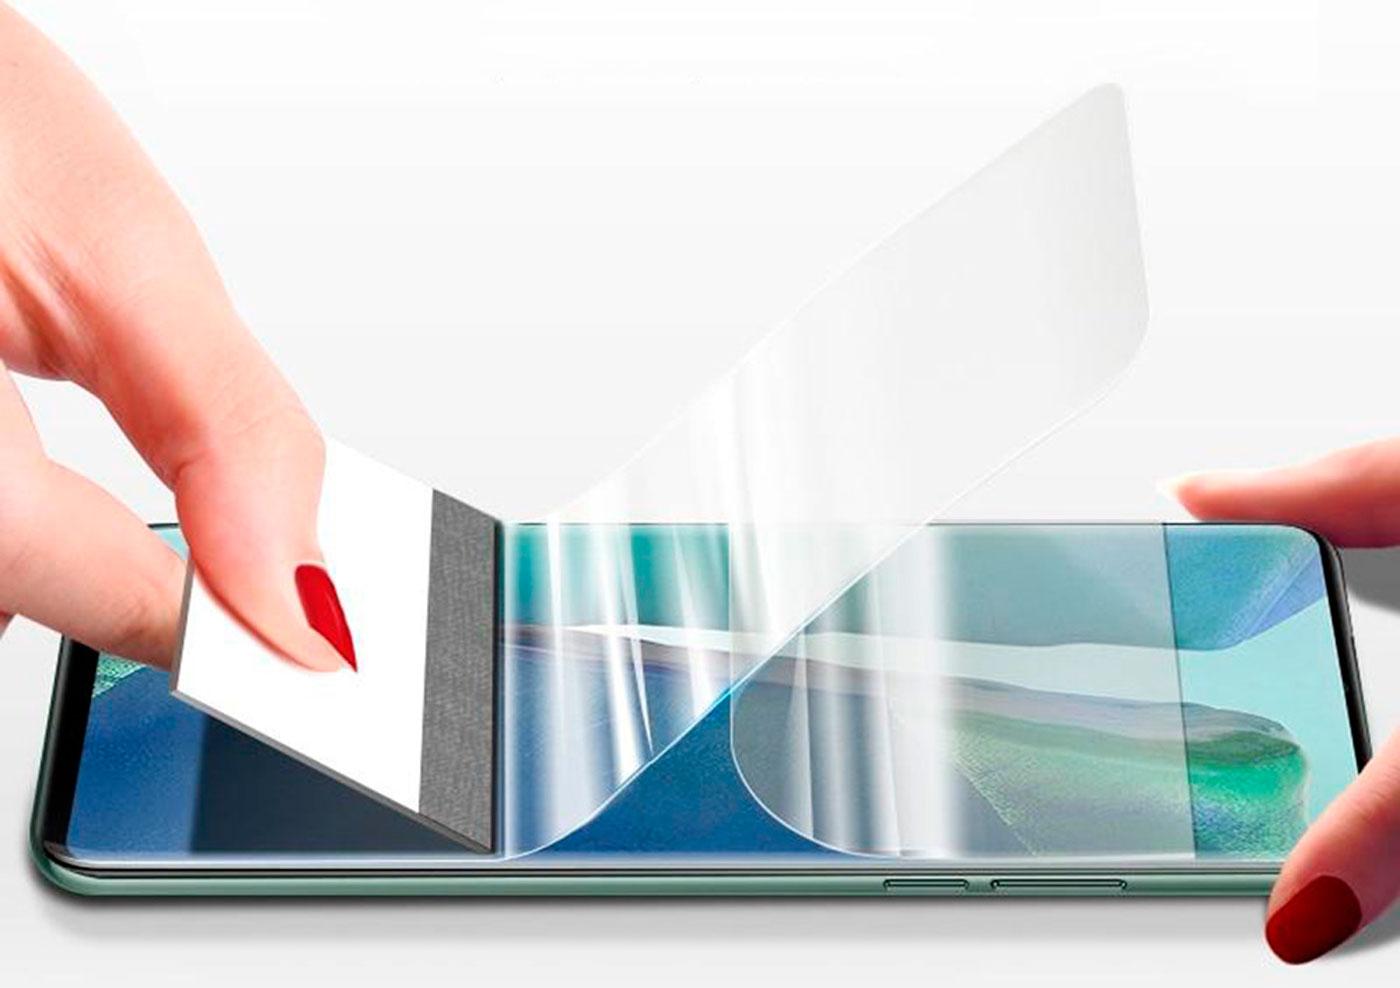 Гидрогелевая пленка на смартфон